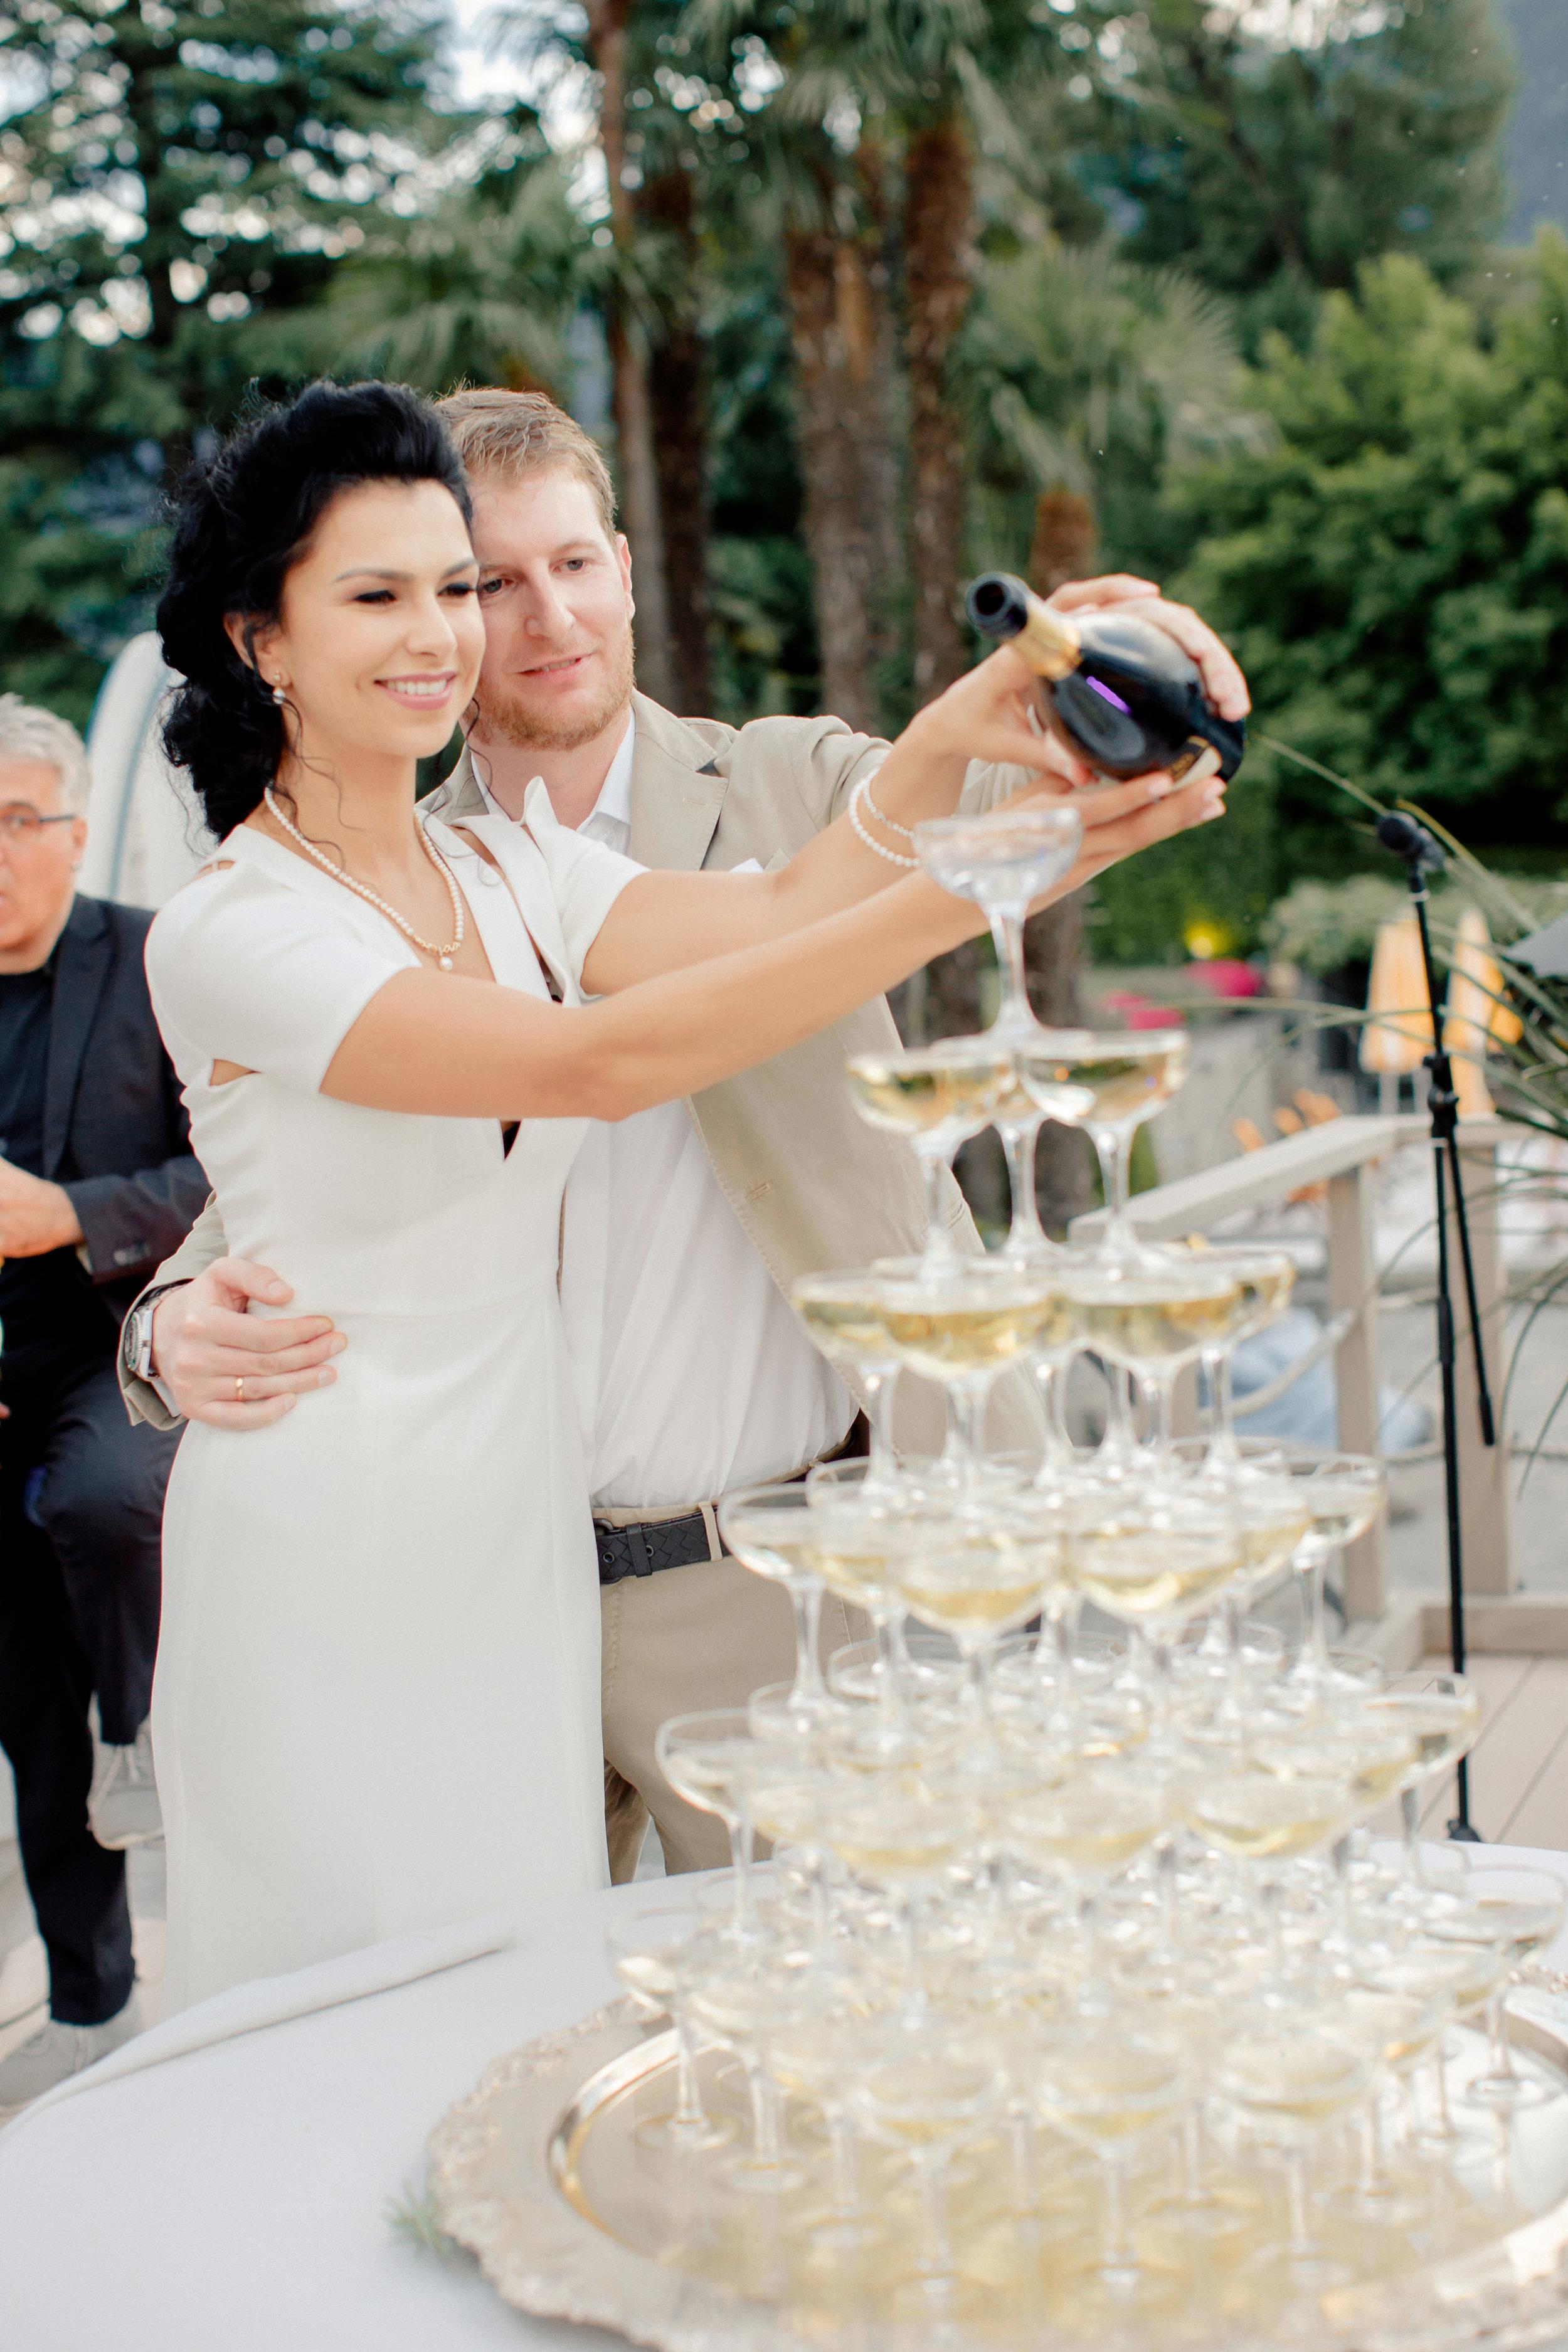 180706-preview-044-Marina-Fadeeva-wedding-photographer.jpg